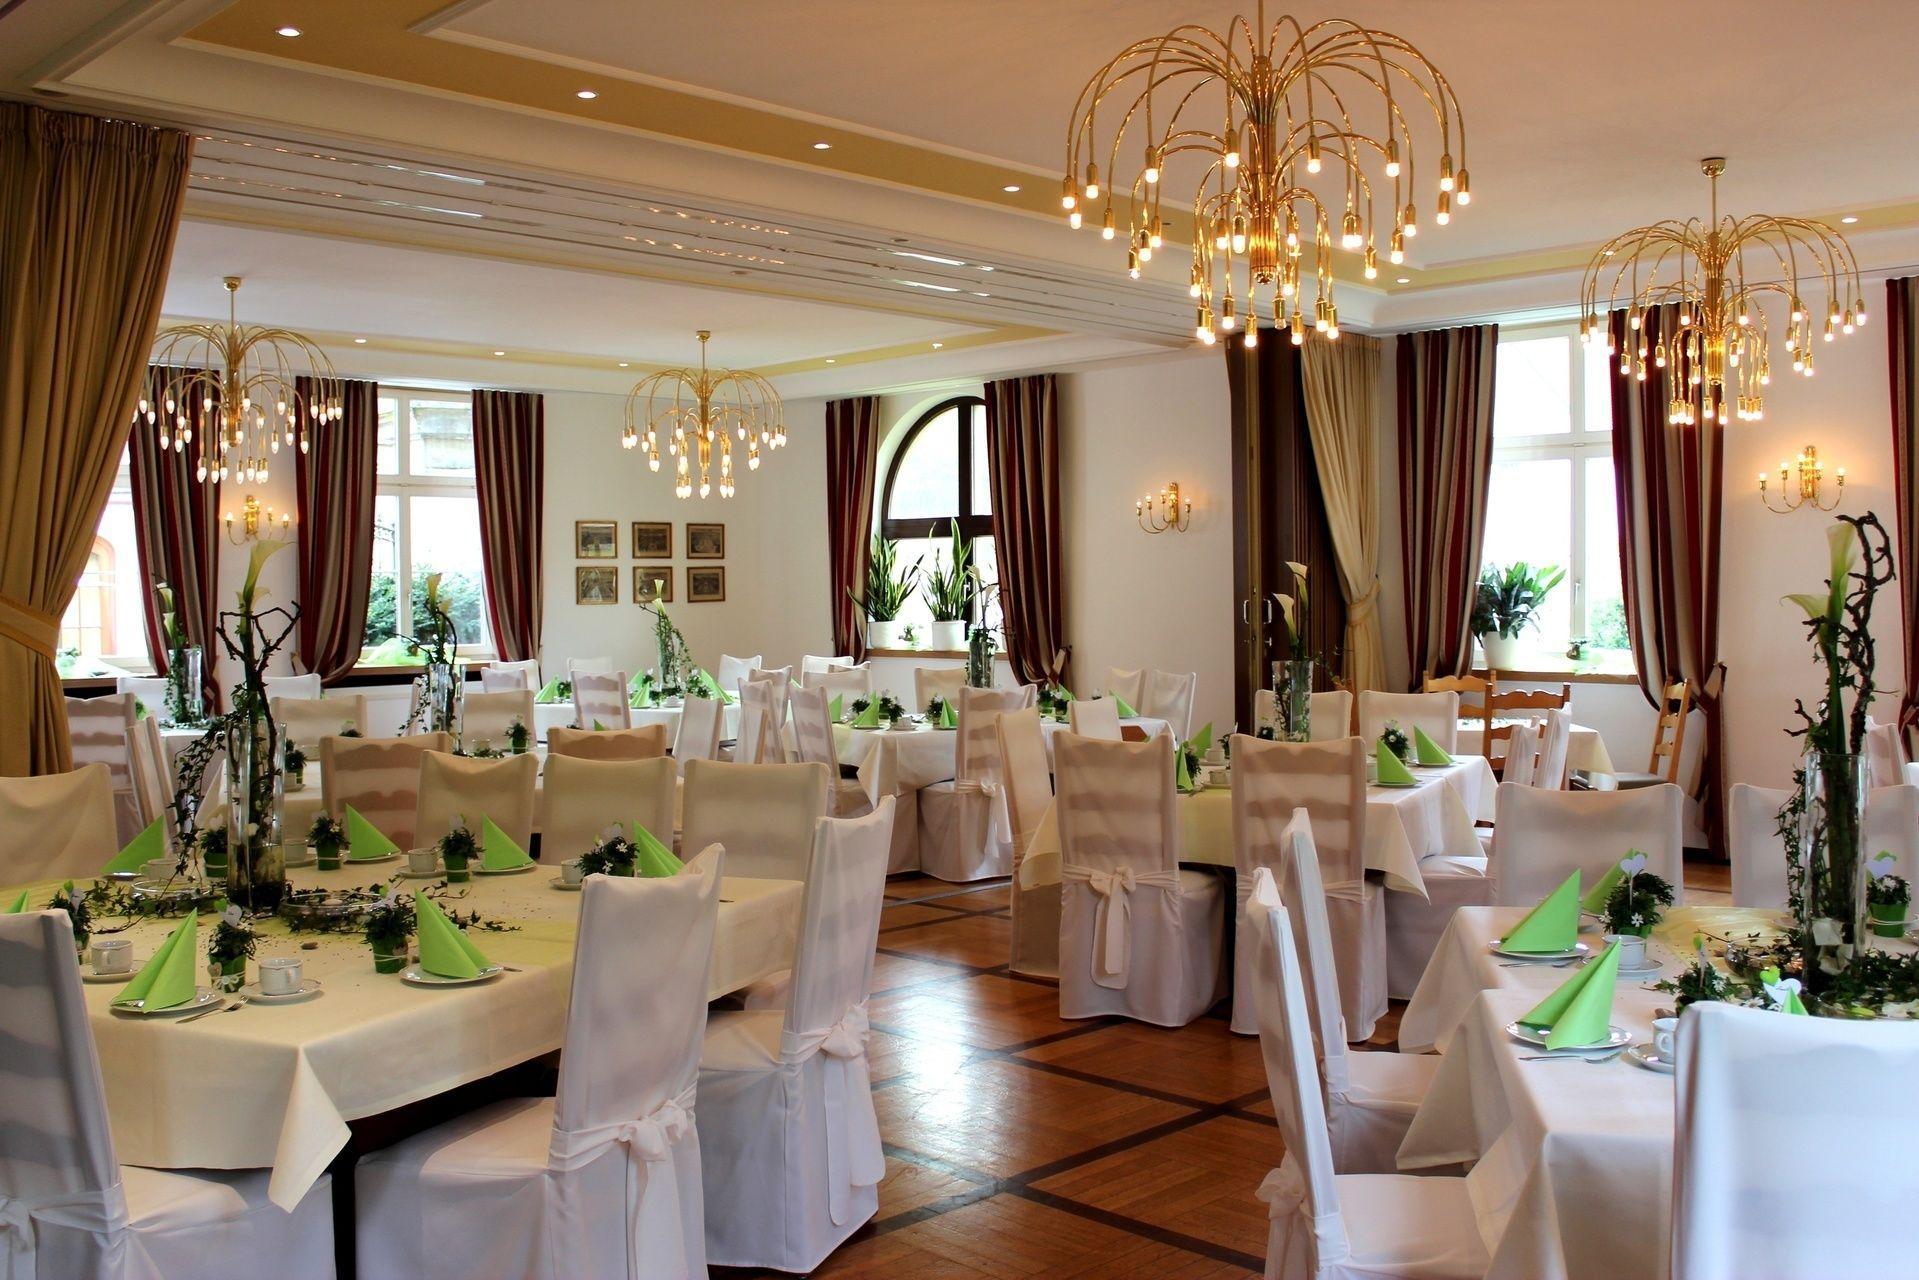 Schlosshotel Monrepos Ludwigsburg Booking Deals Photos Reviews